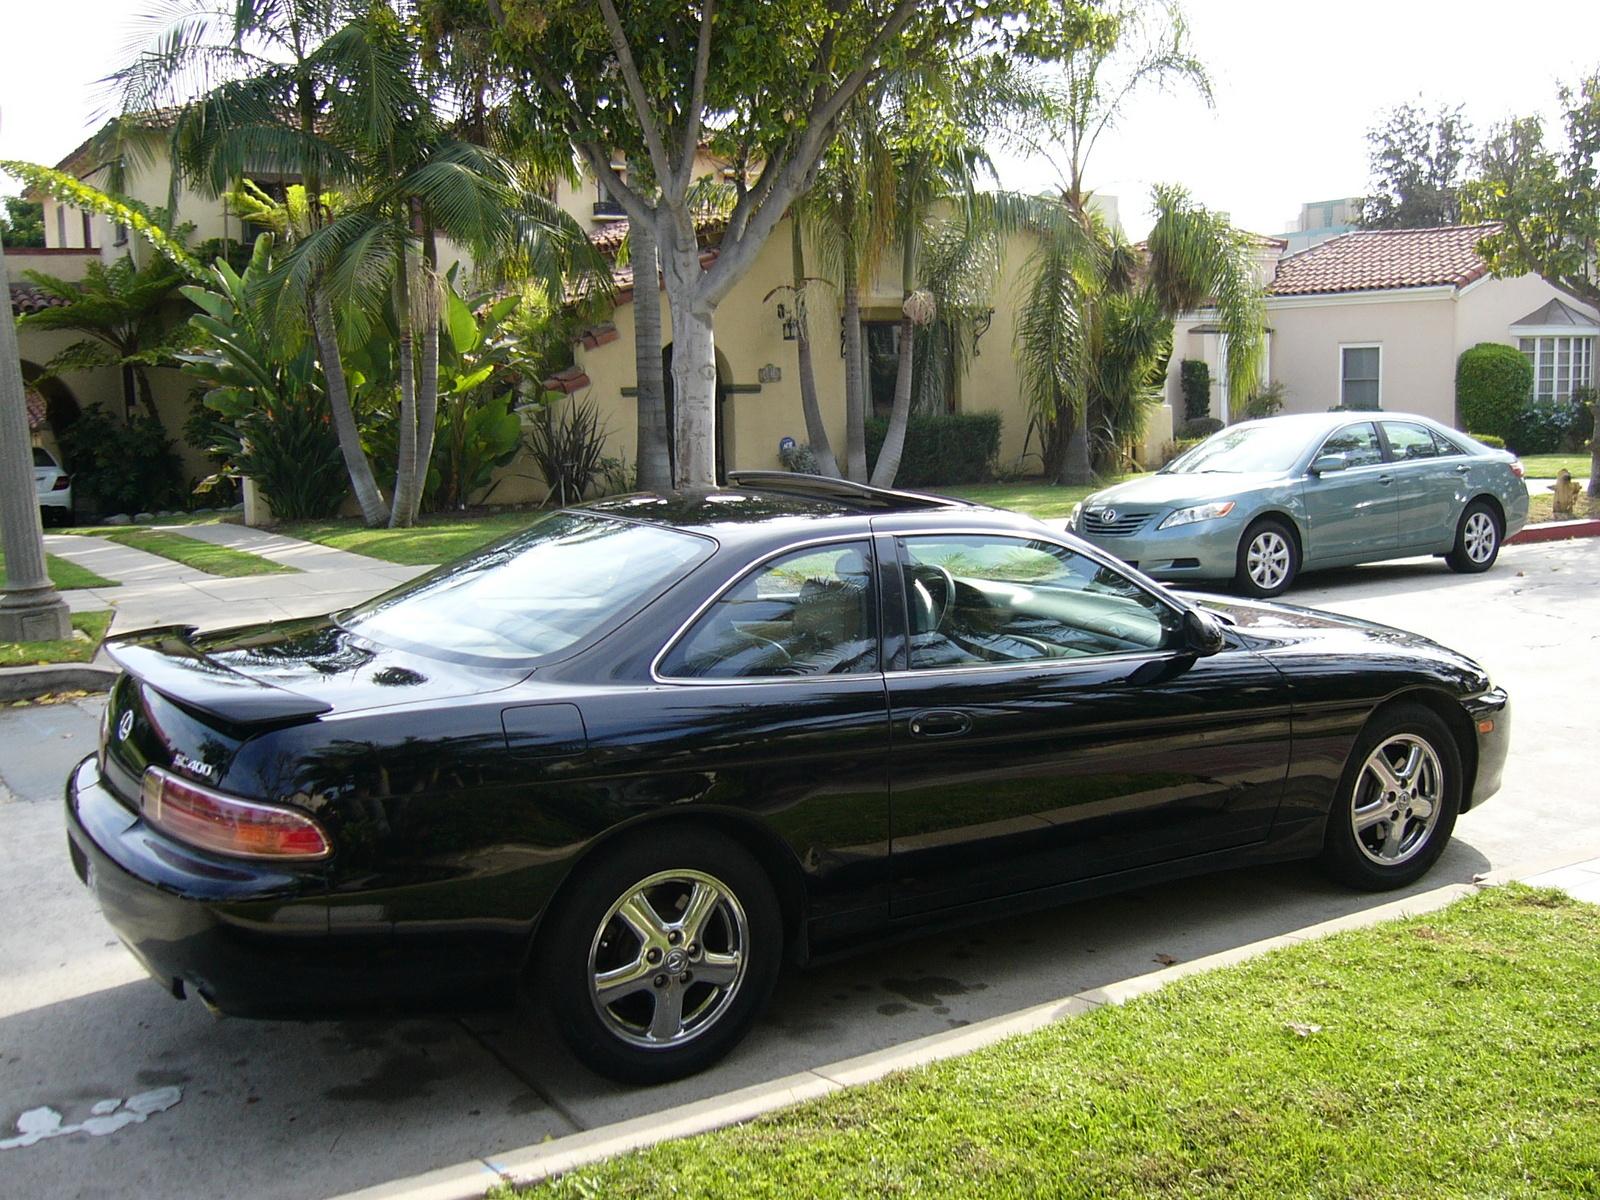 Picture of 1998 Lexus SC 400 Base